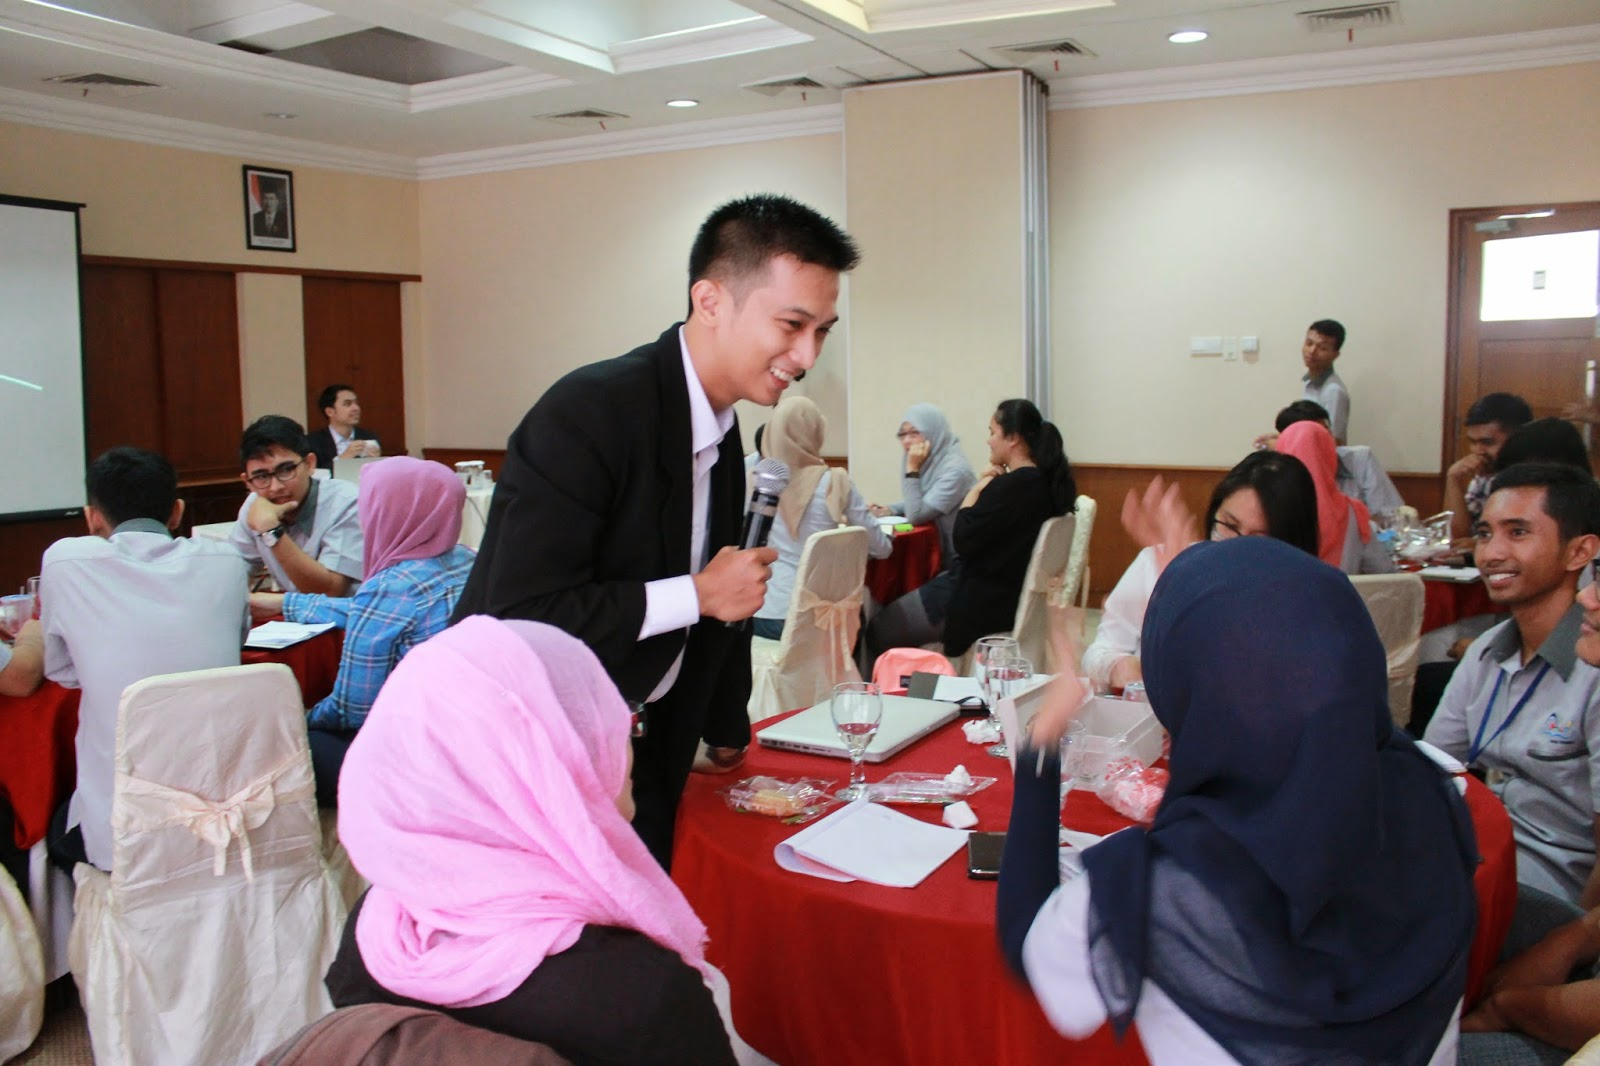 edvan m kautsar, edvan muhammad kautsar, motivator indonesia, Motivator Muda, motivator nasional, motivator terbaik, motivator wirausaha, training motivasi, motivator perusahaan, motivator karyawan